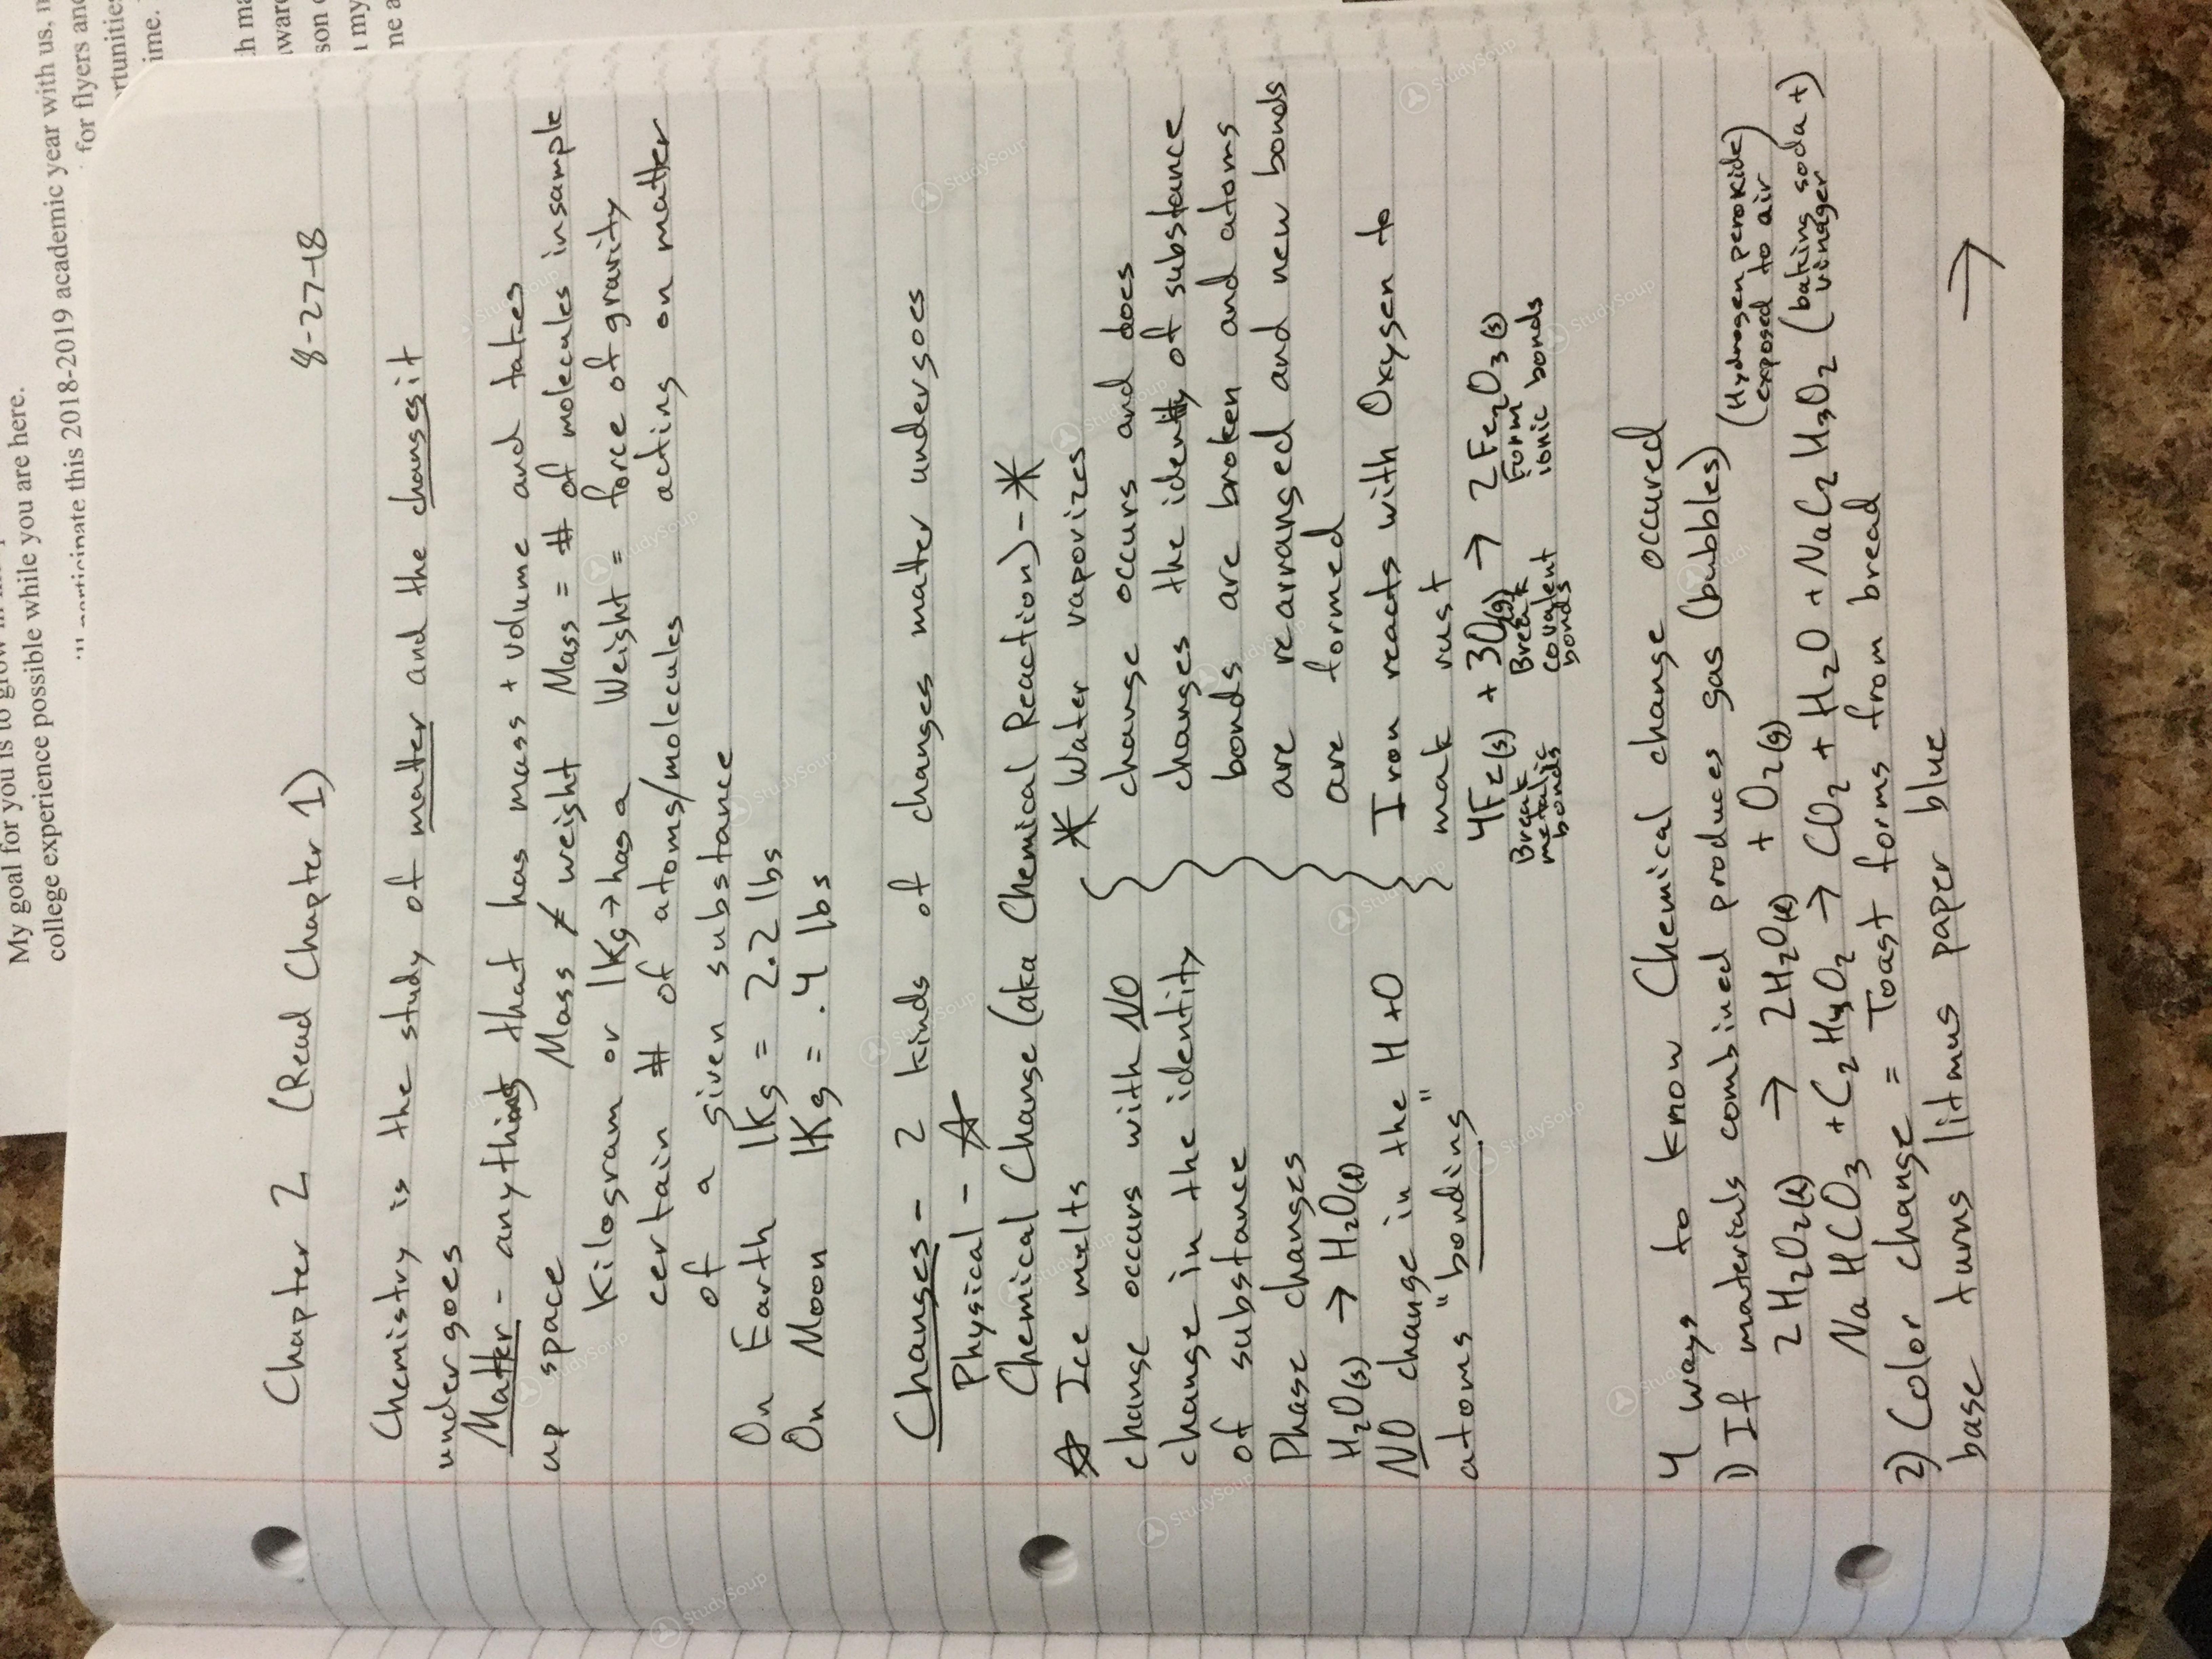 ETSU - CHEM 1030 - Class Notes - Week 1 | StudySoup